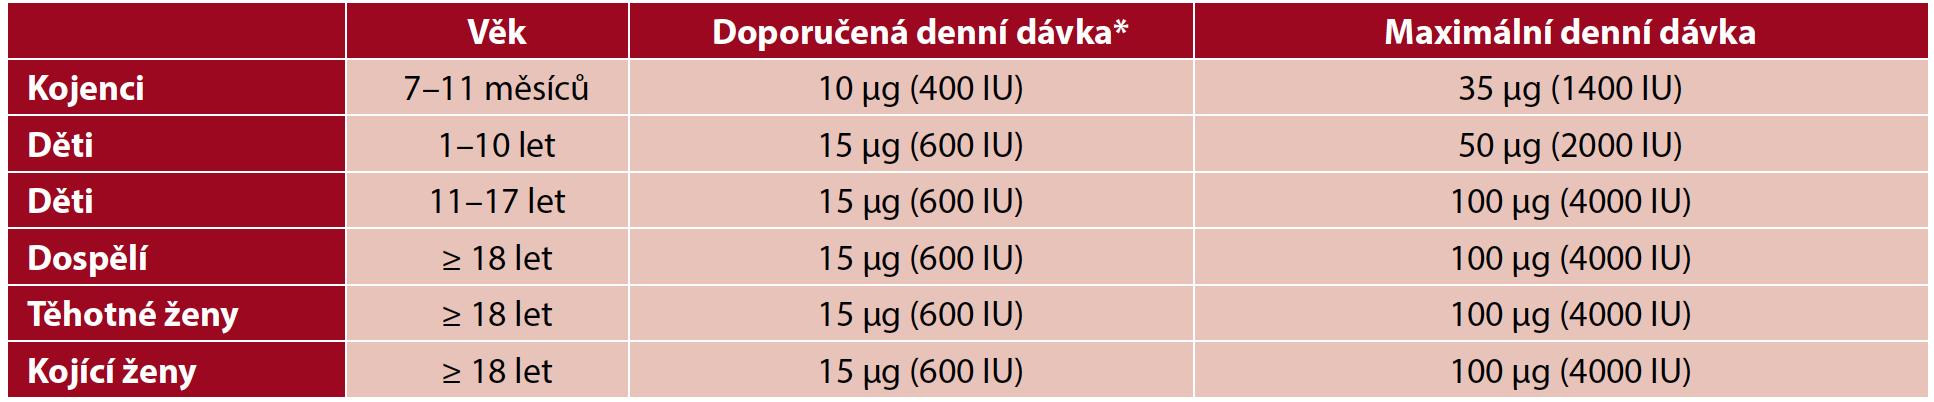 Doporučené denní dávky vitaminu D dle EFSA (13)